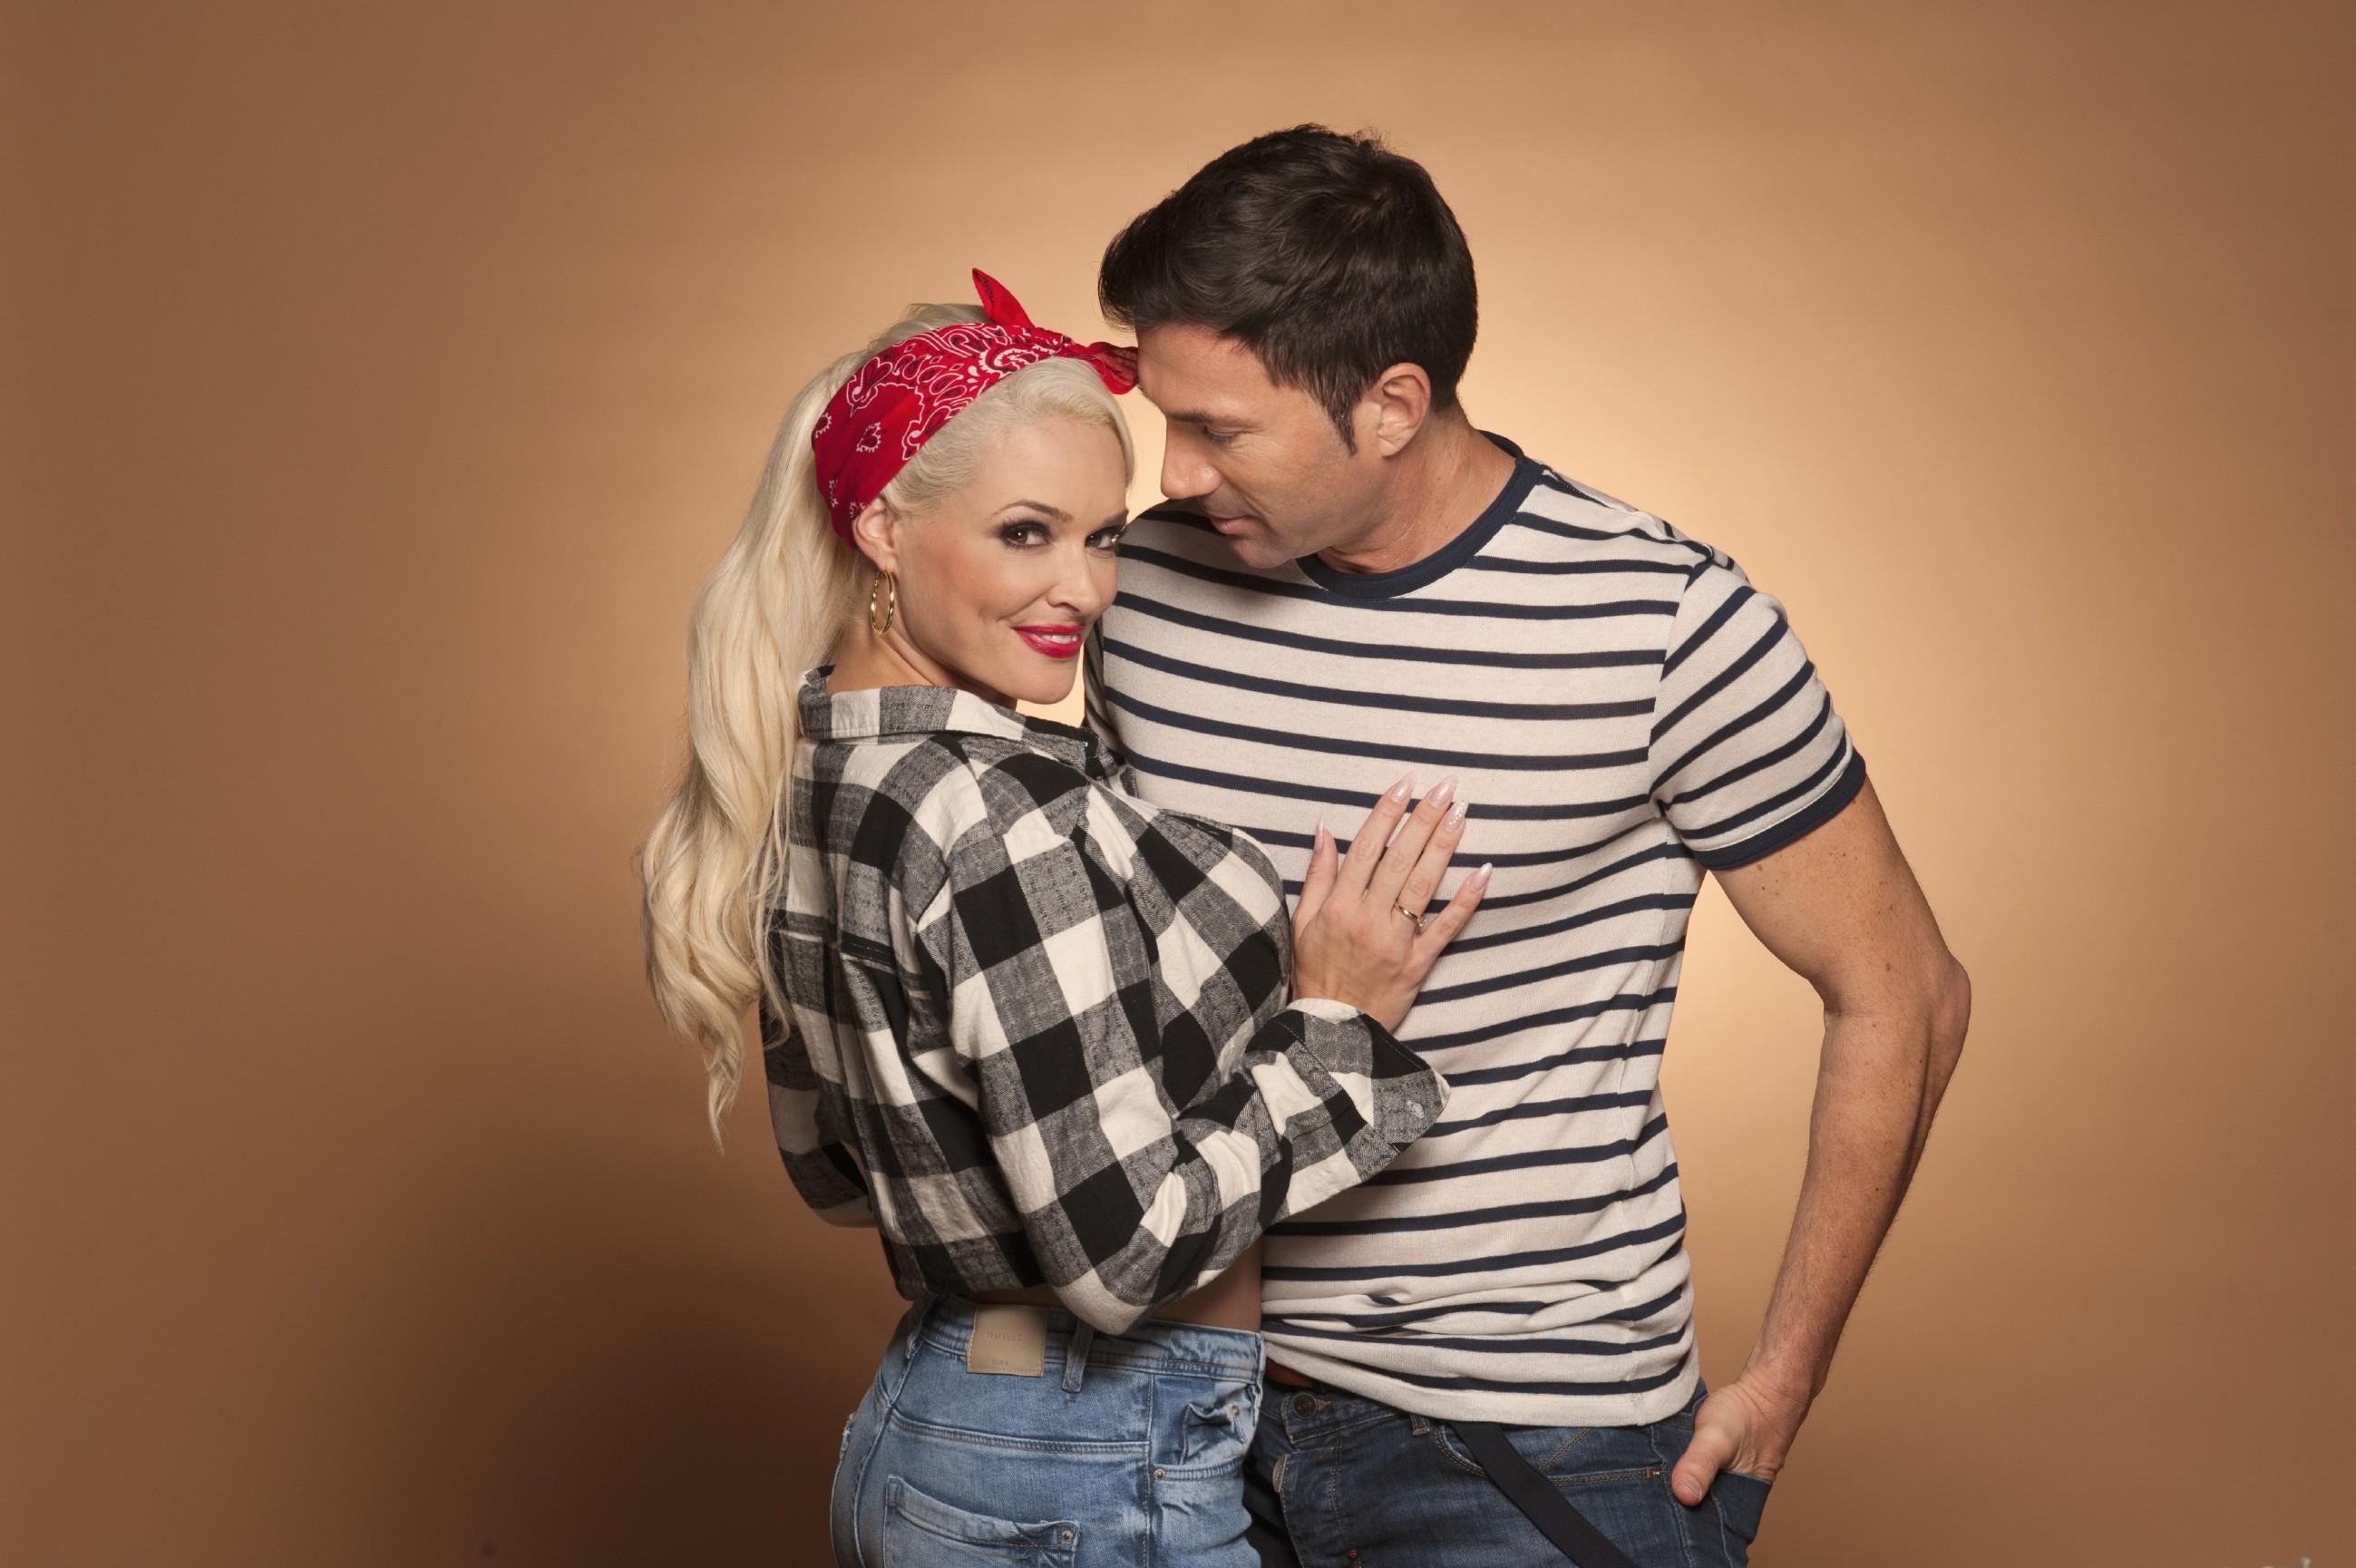 Daniela Katzenberger und Lucas Cordalis - Foto: RTL / Stephan Pick